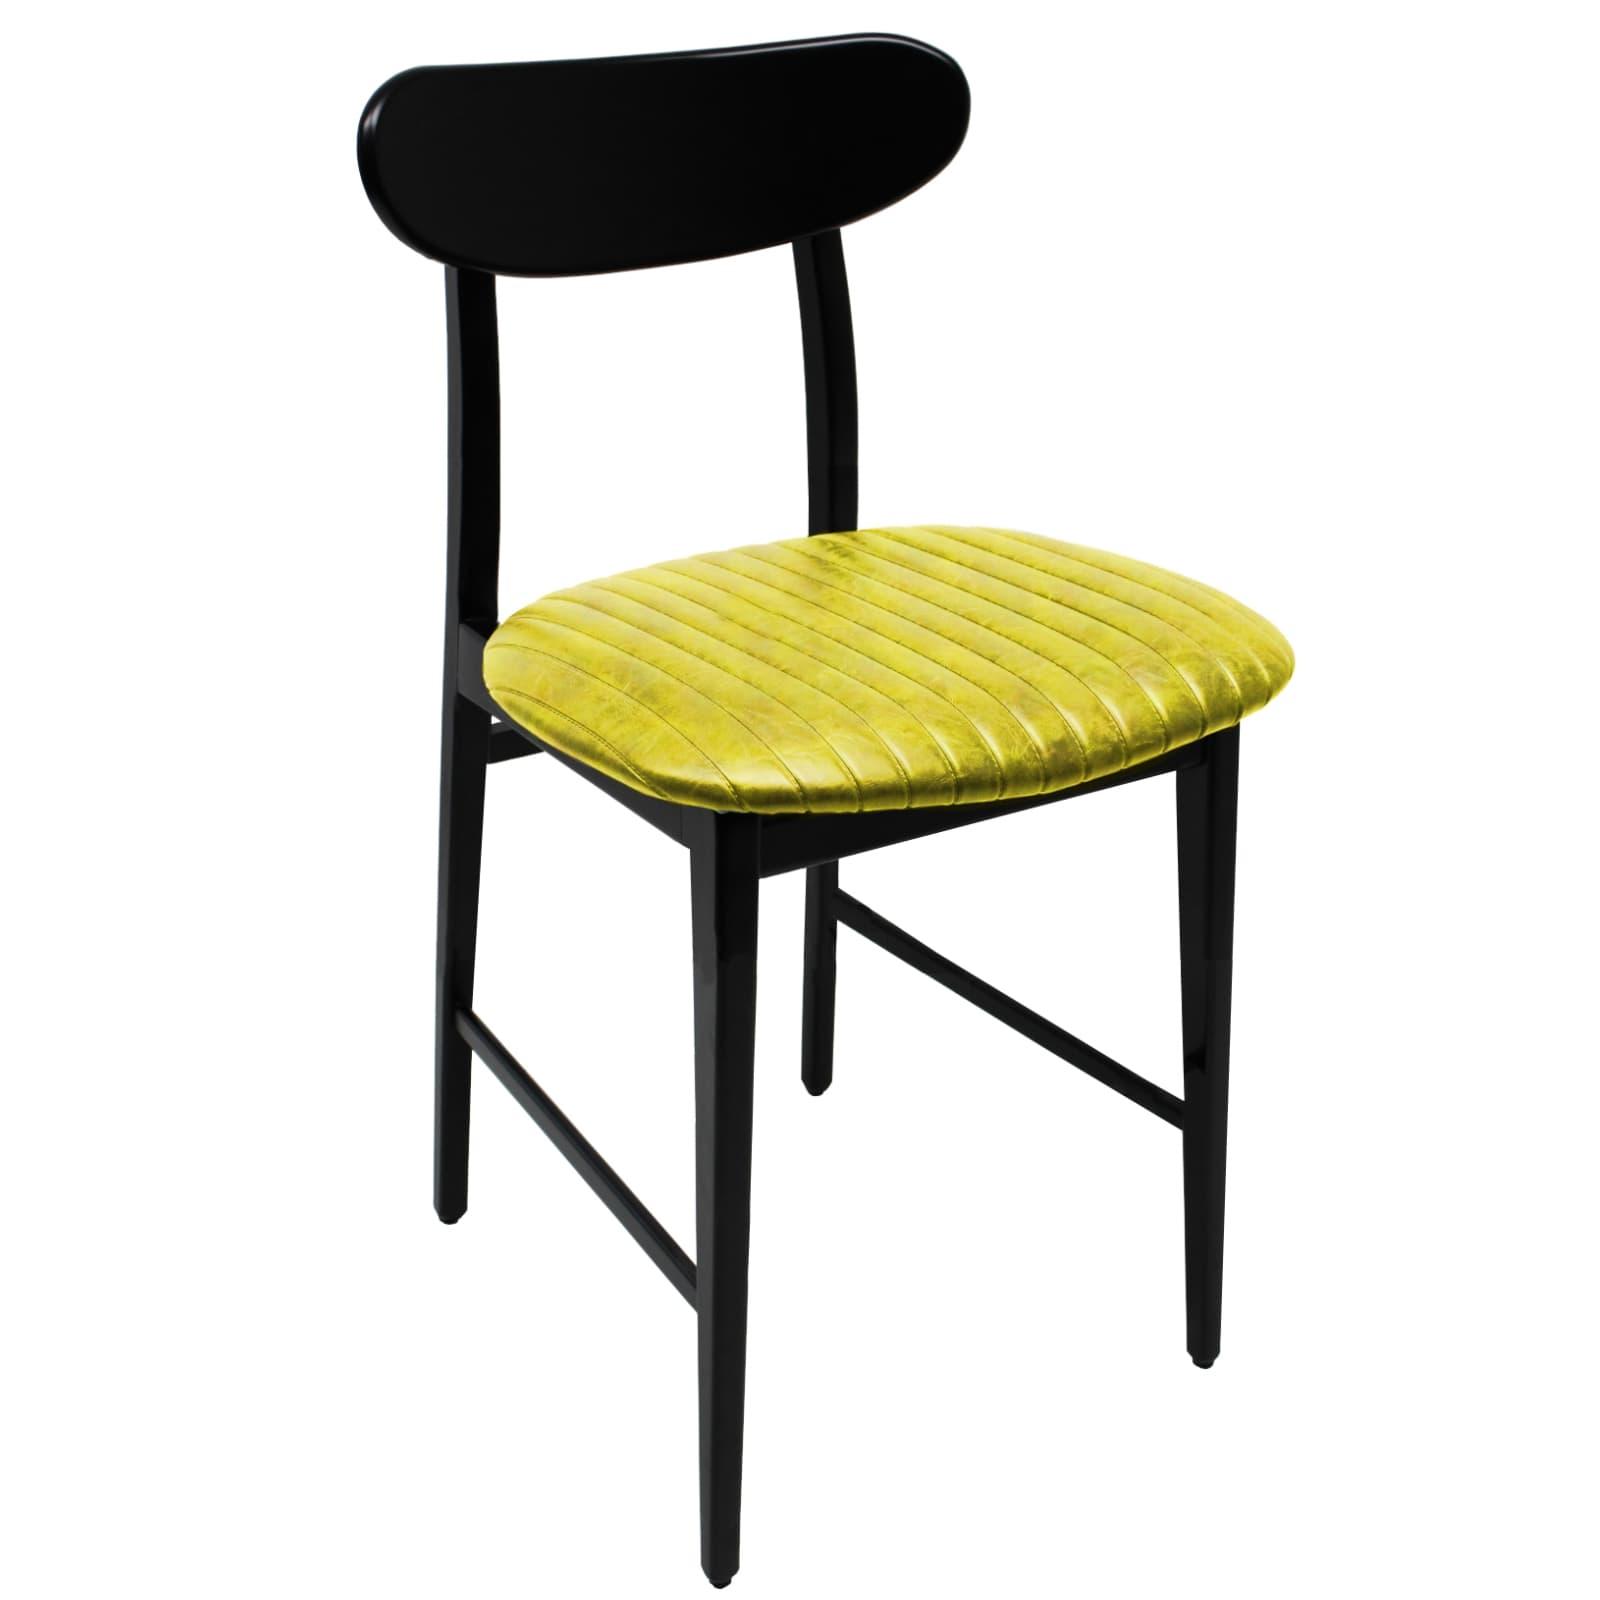 Sedia in Ecopelle giallo stile Vintage con gambe e spalliera in ...